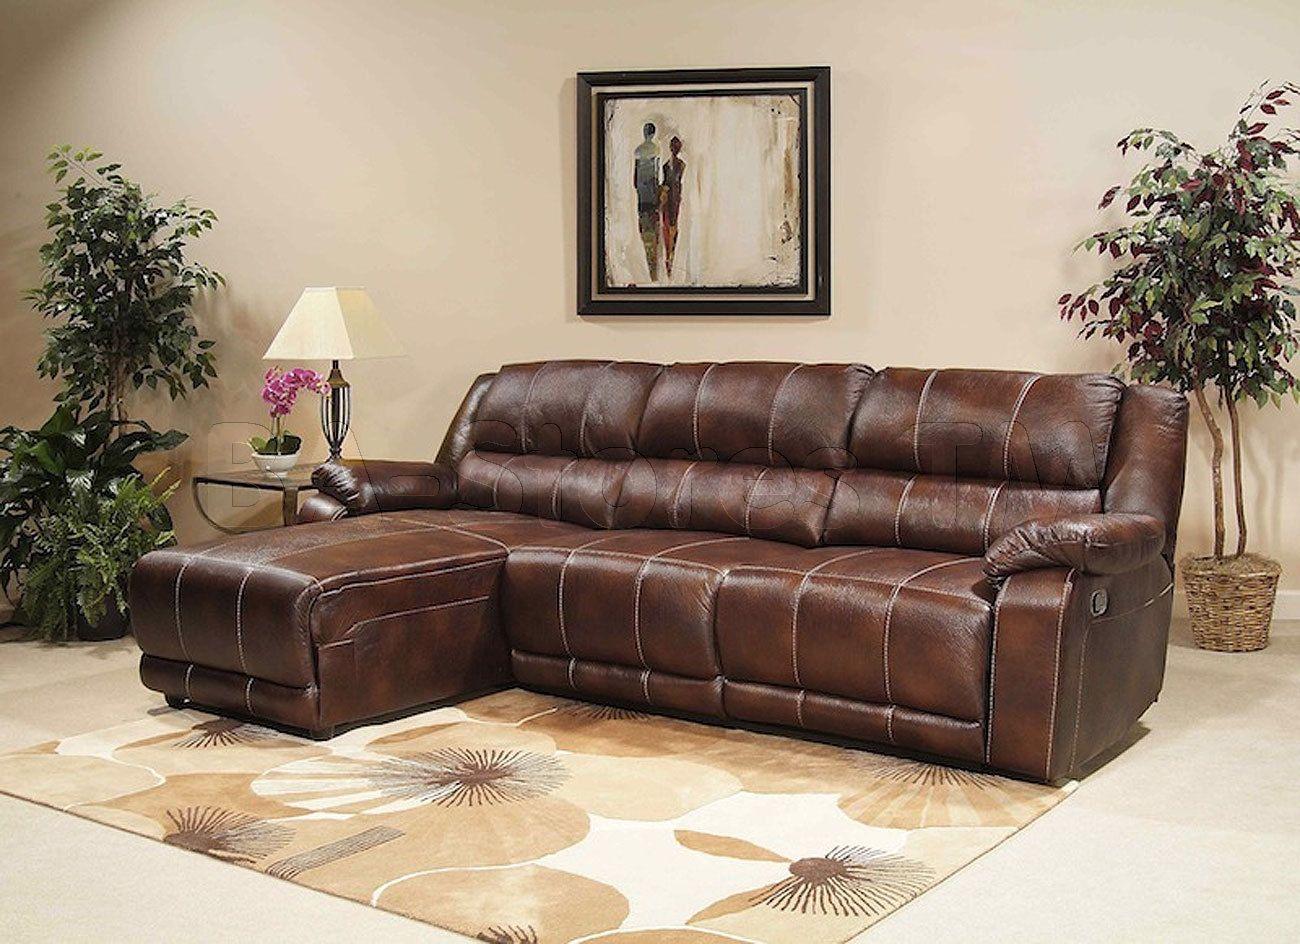 Arlington Collection 300132 Black Futon | Black futon Leather sofa bed and Sleeper sofas & Arlington Collection 300132 Black Futon | Black futon Leather ... islam-shia.org